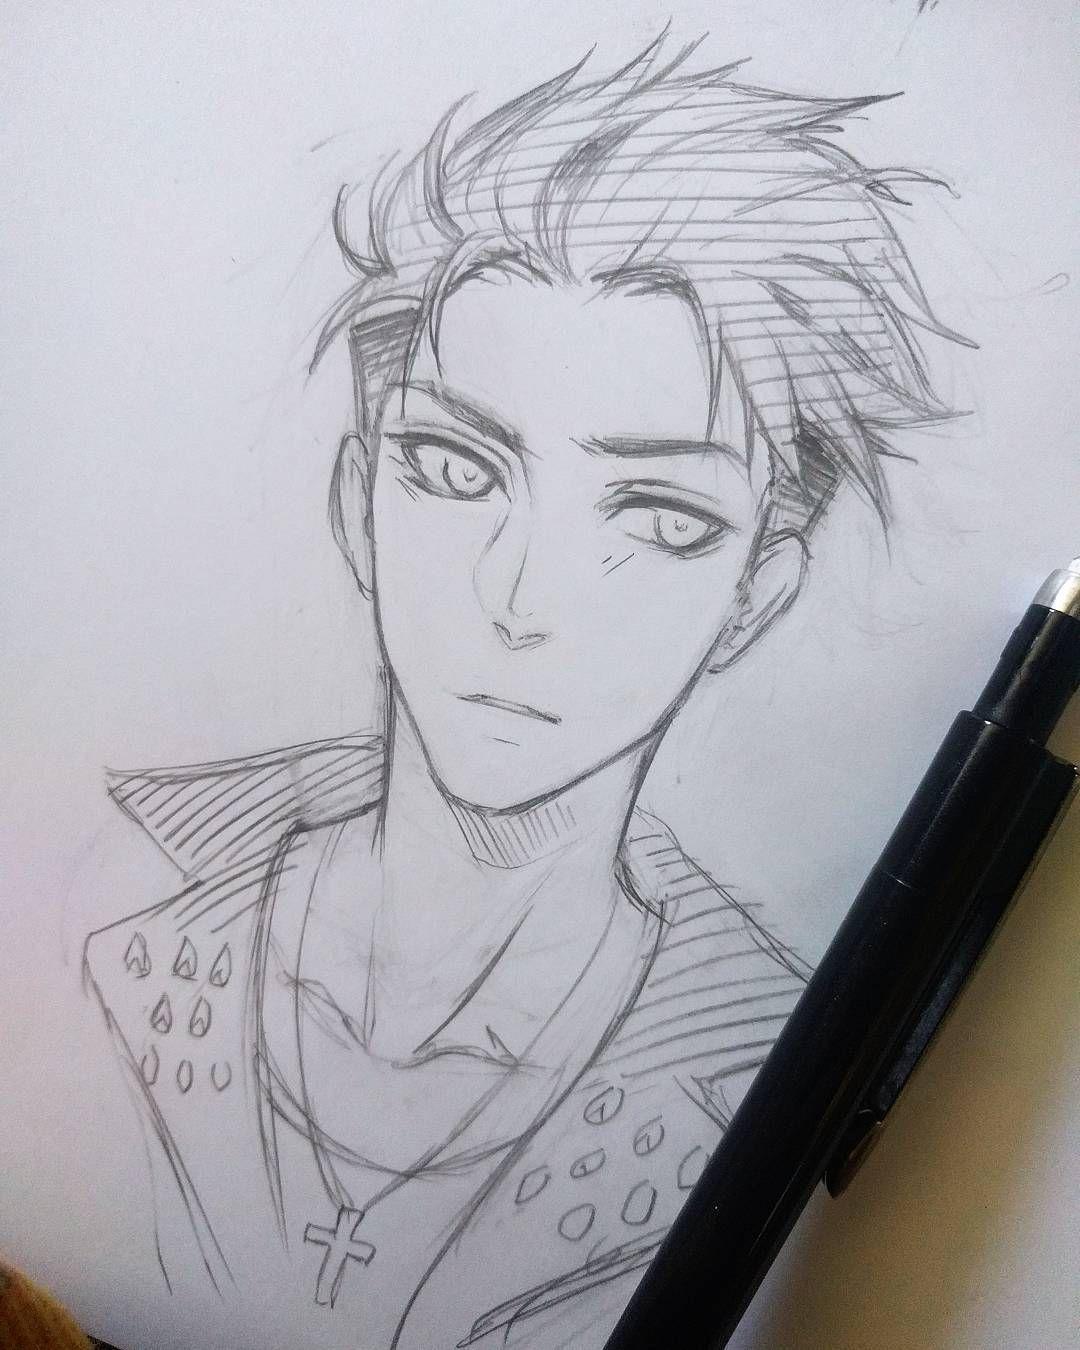 Tried To Draw Otabekaltin D Bishonen Filter On Fleek Yurionice Drawing Otabek Ske Anime Drawings Sketches Anime Drawings Boy Anime Drawings Tutorials